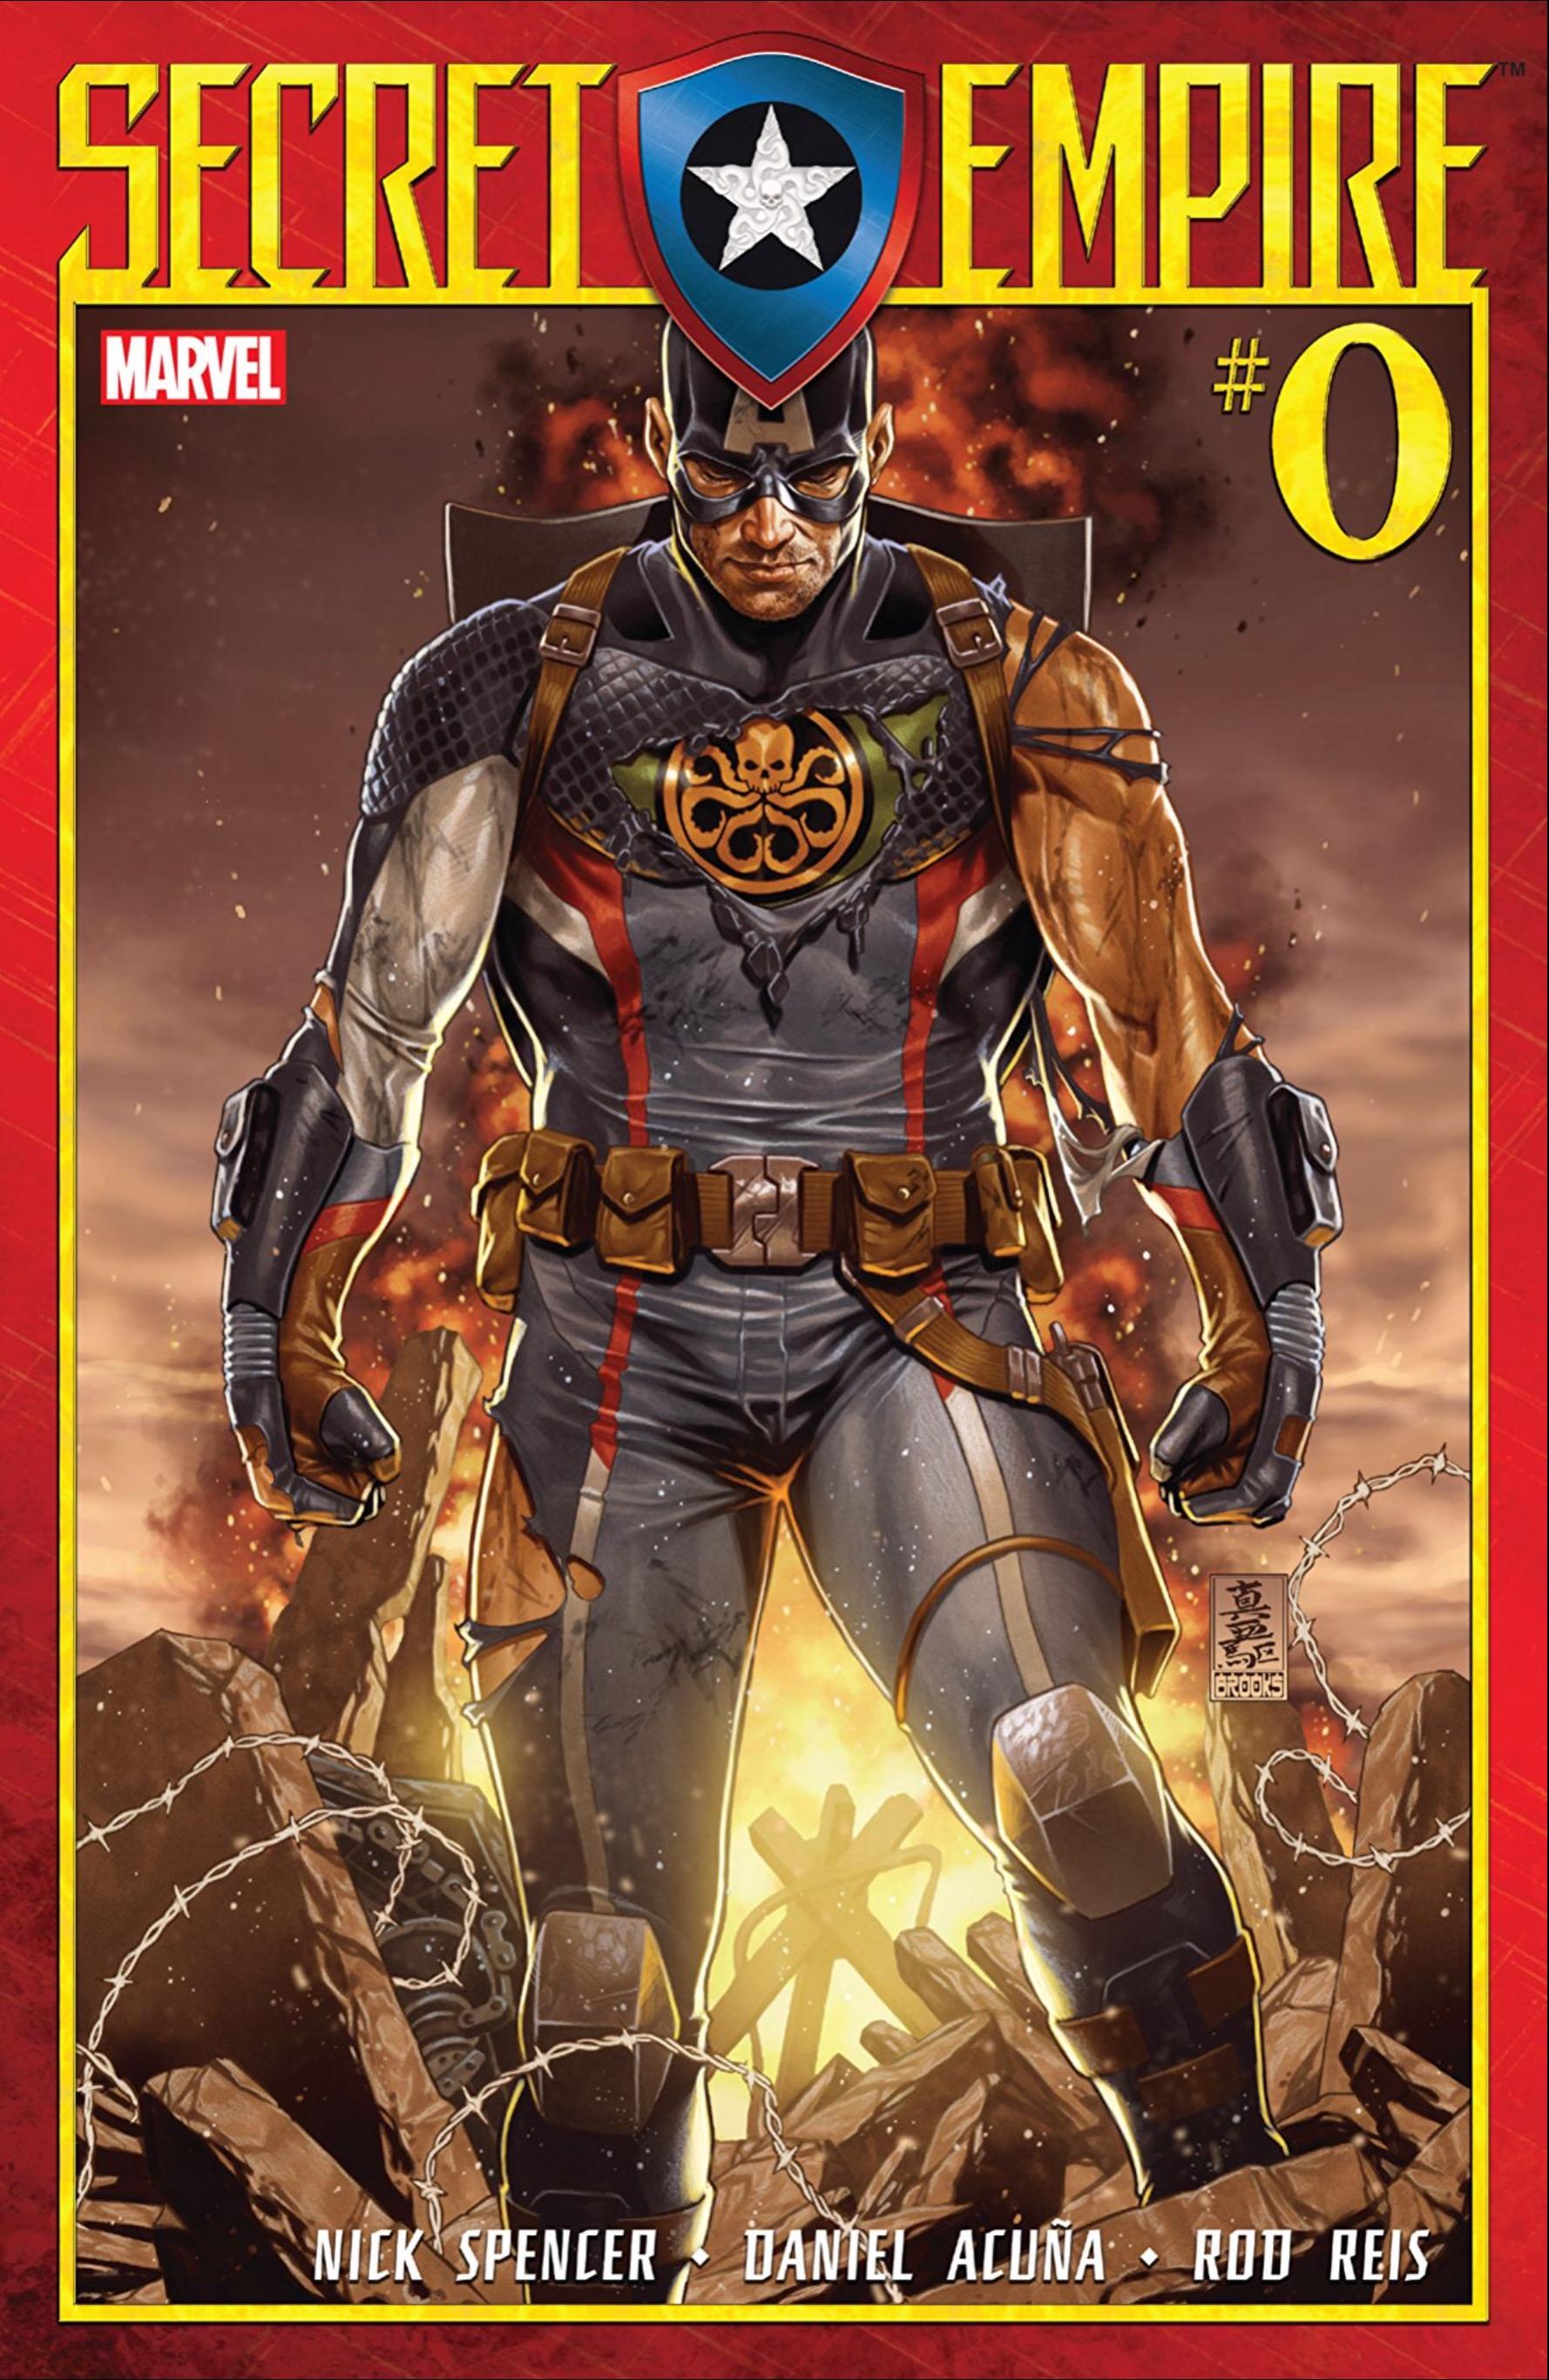 Marvel's Secret Empire kicks off by doubling down on Captain America's Nazi past